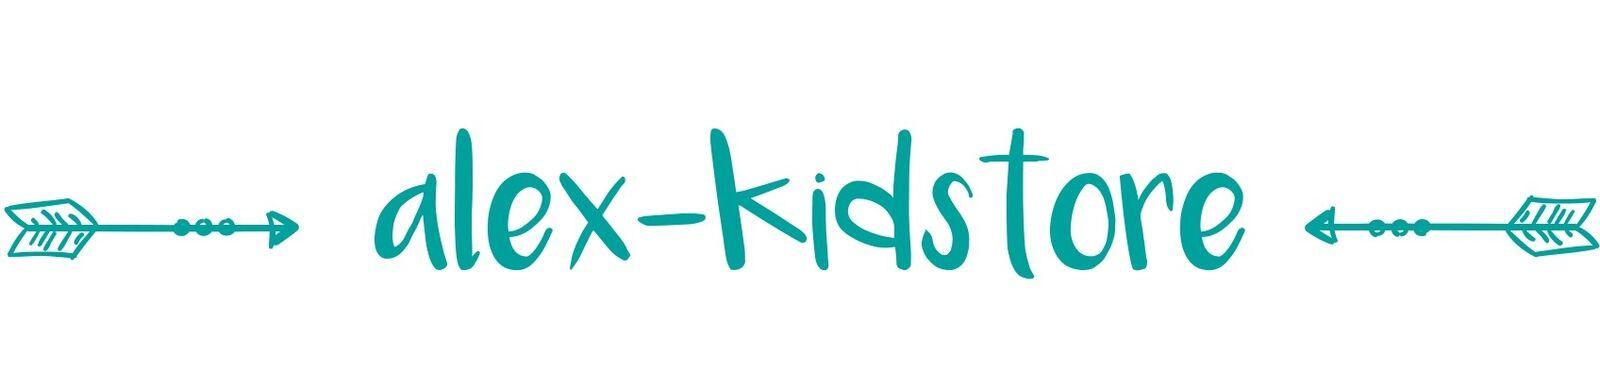 alex-kidstore